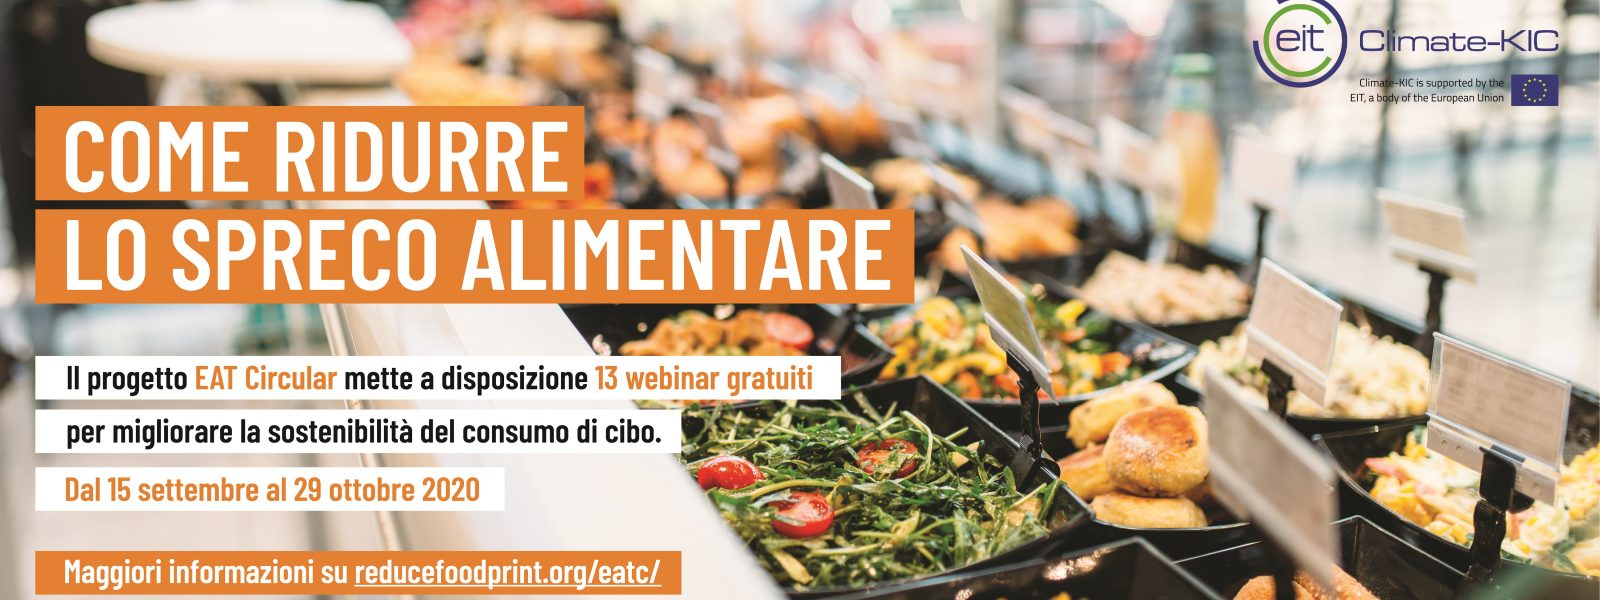 EAT-Circular - Save it for Good! - Evento del 17 settembre